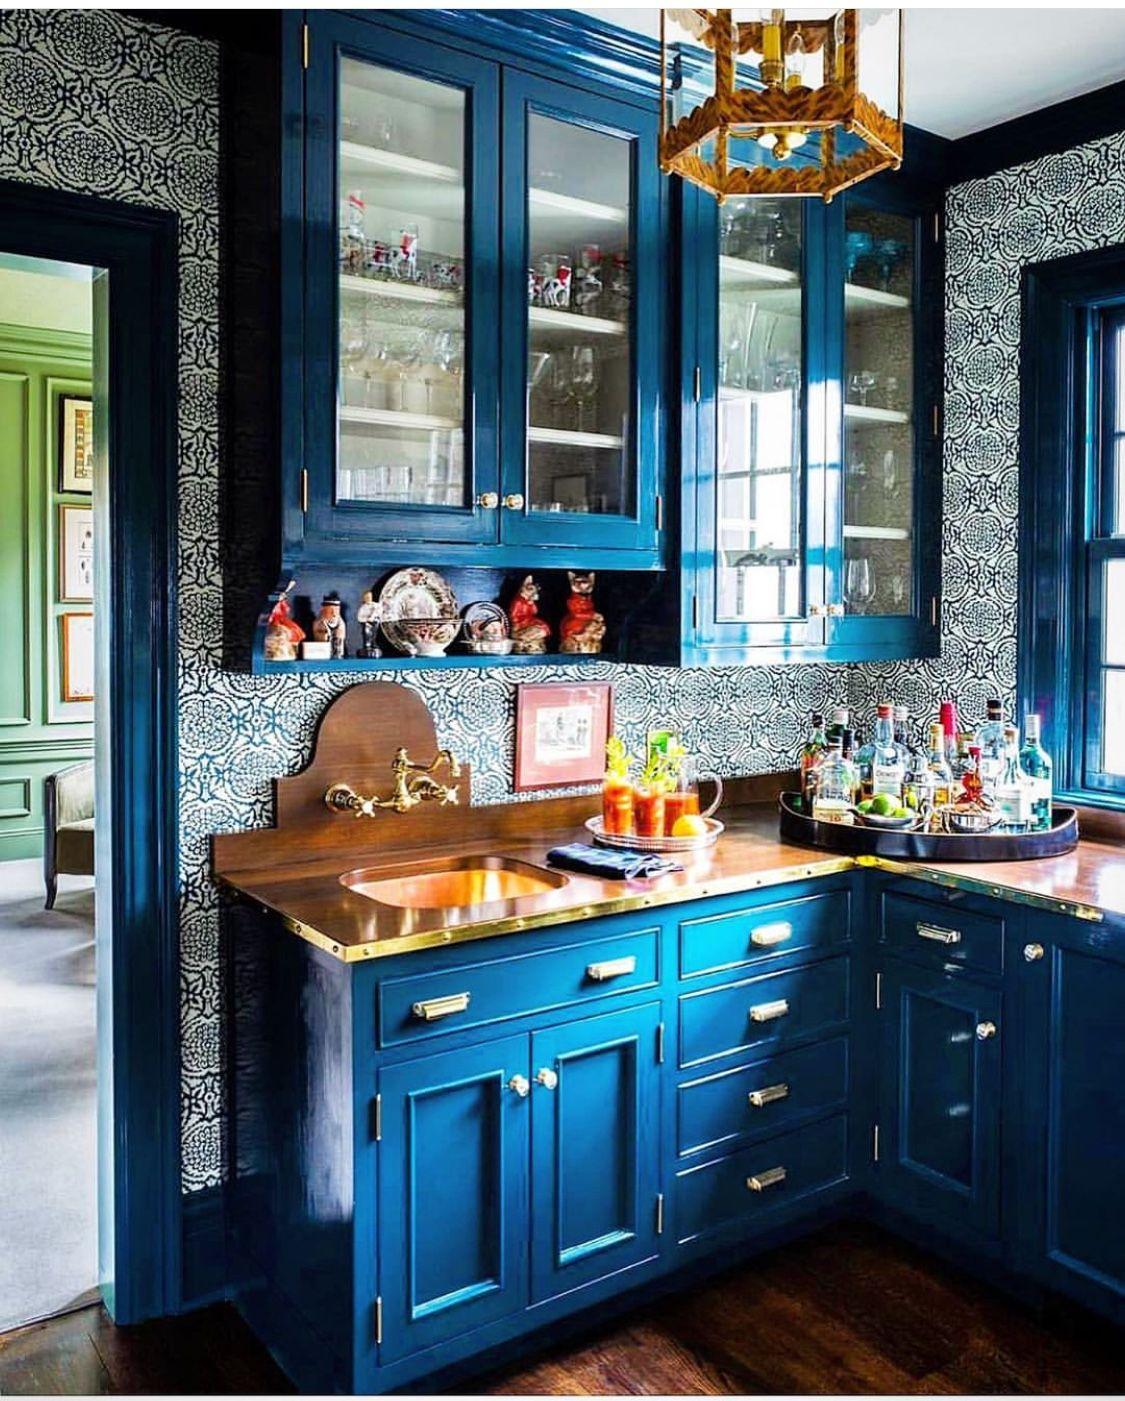 pinfabiola crespo on kitchen tools  decorating ideas